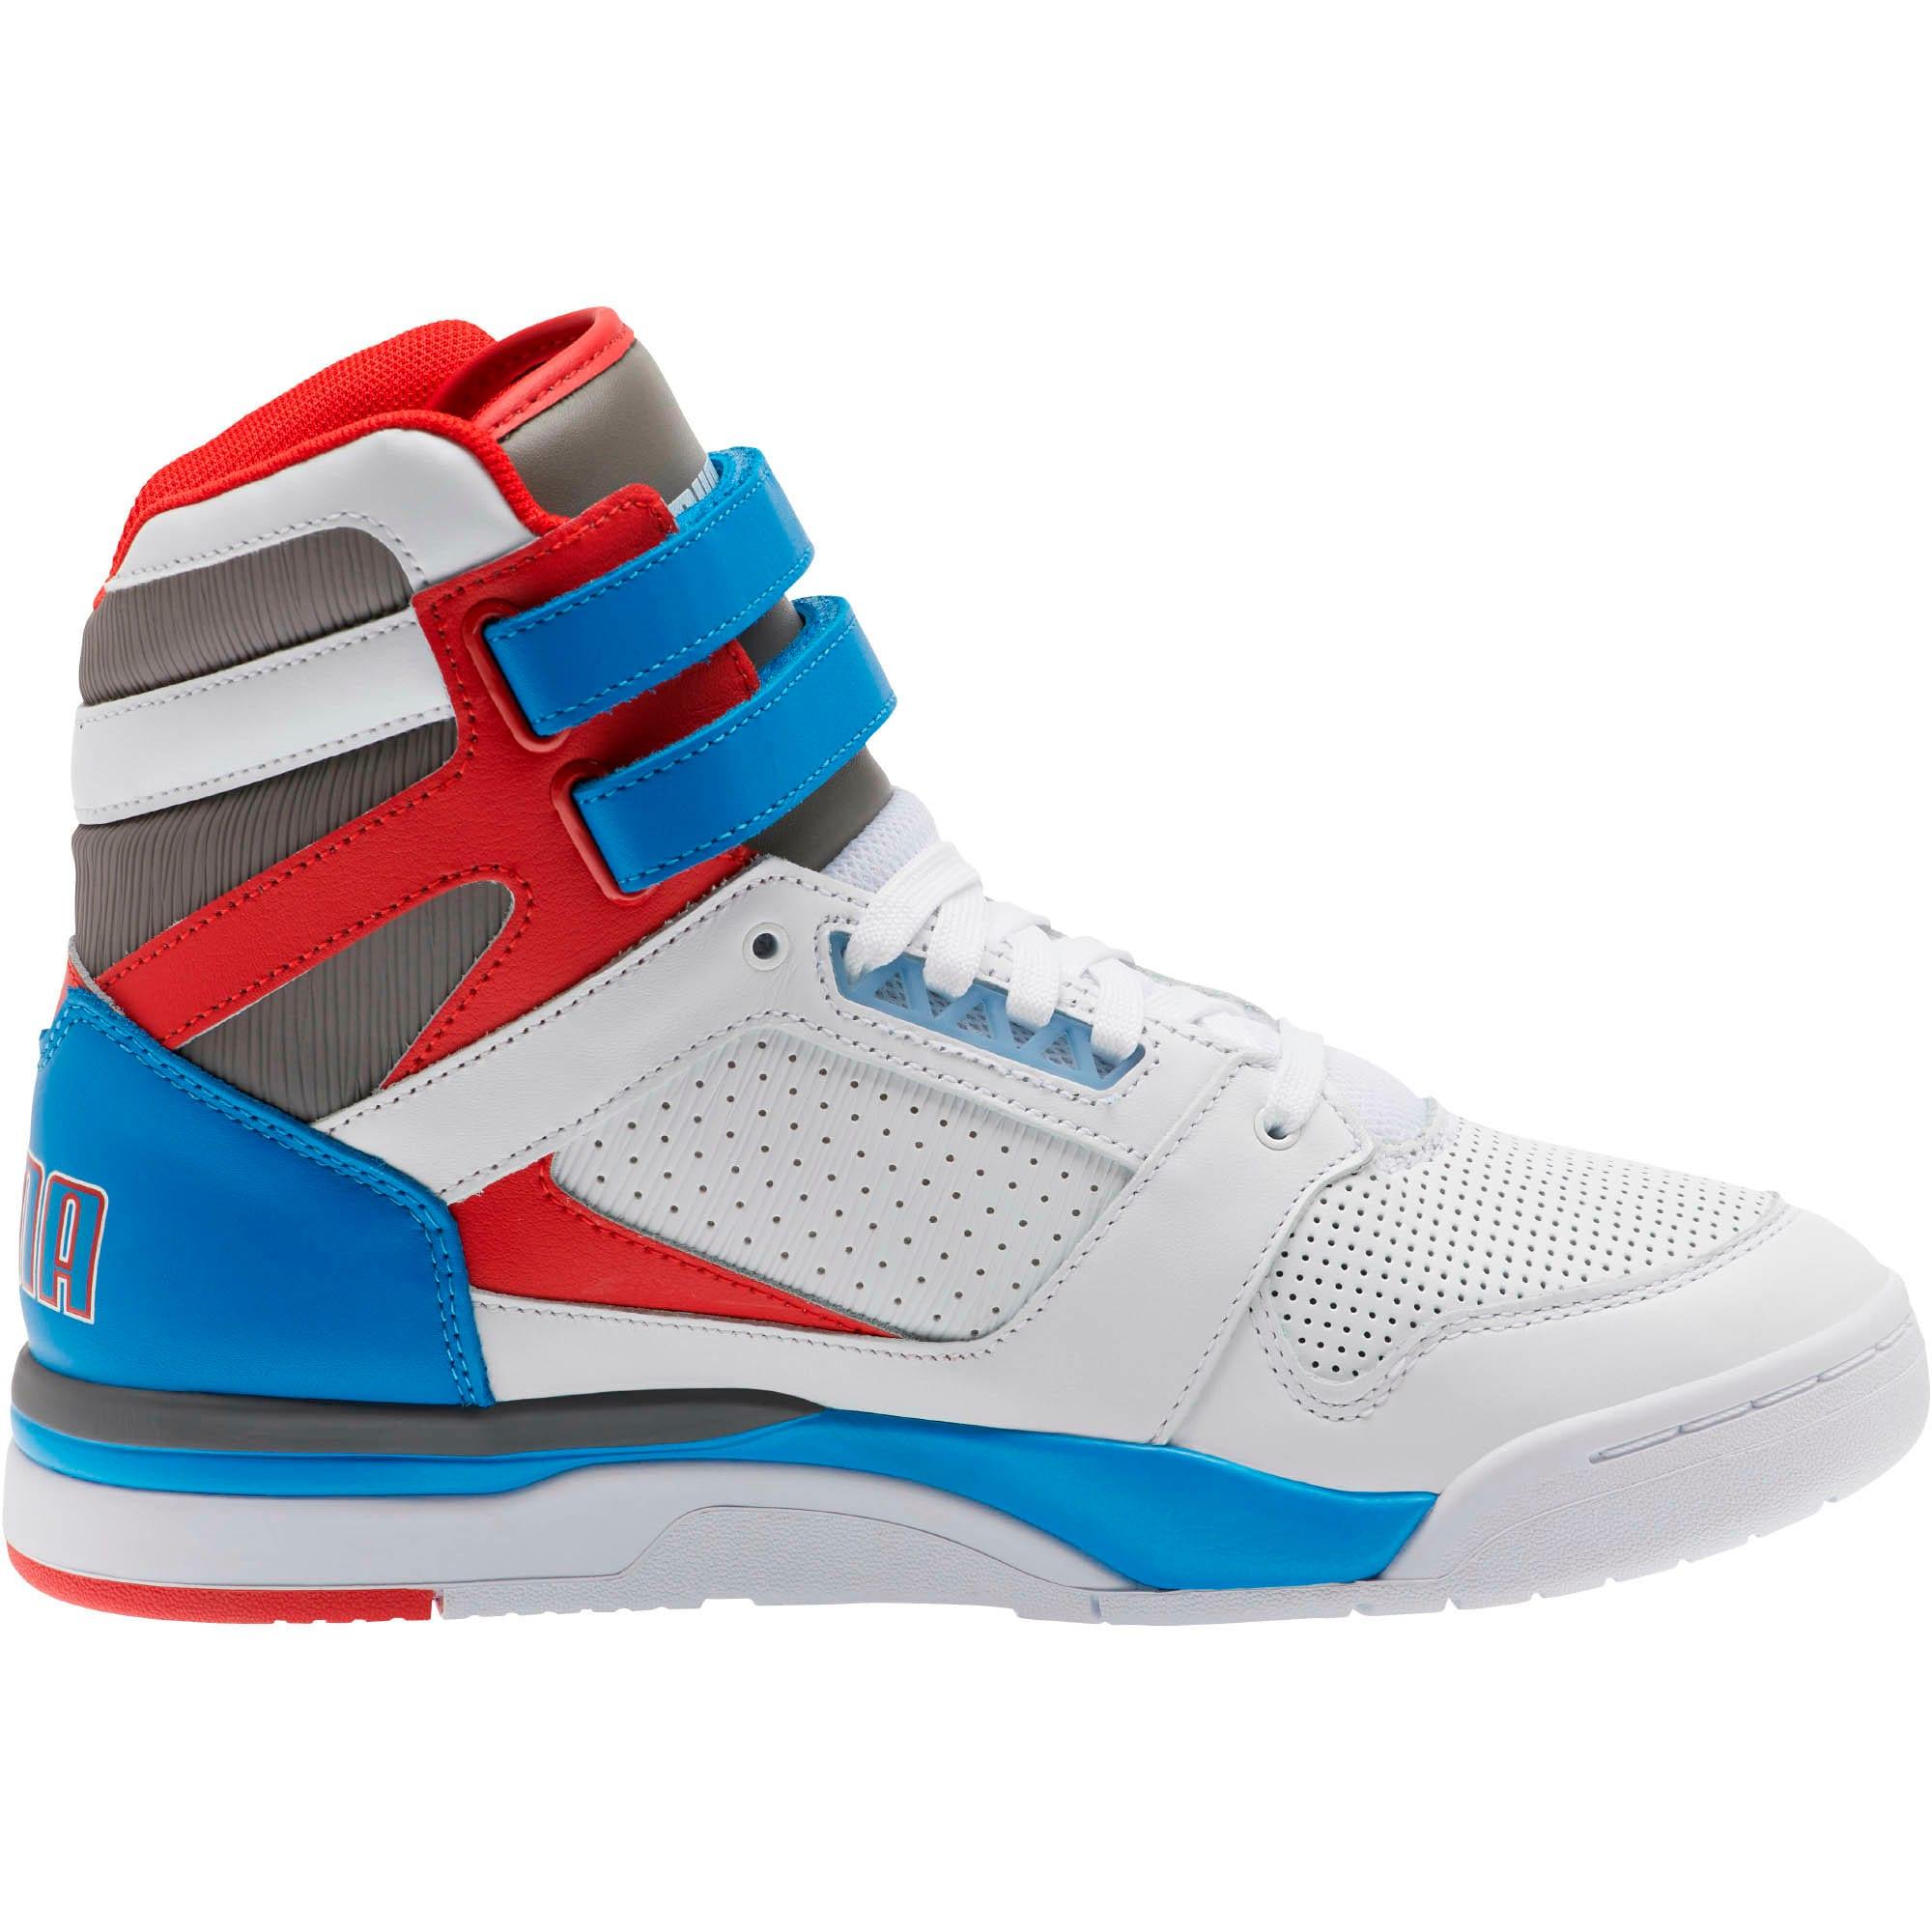 Thumbnail 4 of Palace Guard Mid Retro Sneakers, White-Indigo Bunting-Red, medium